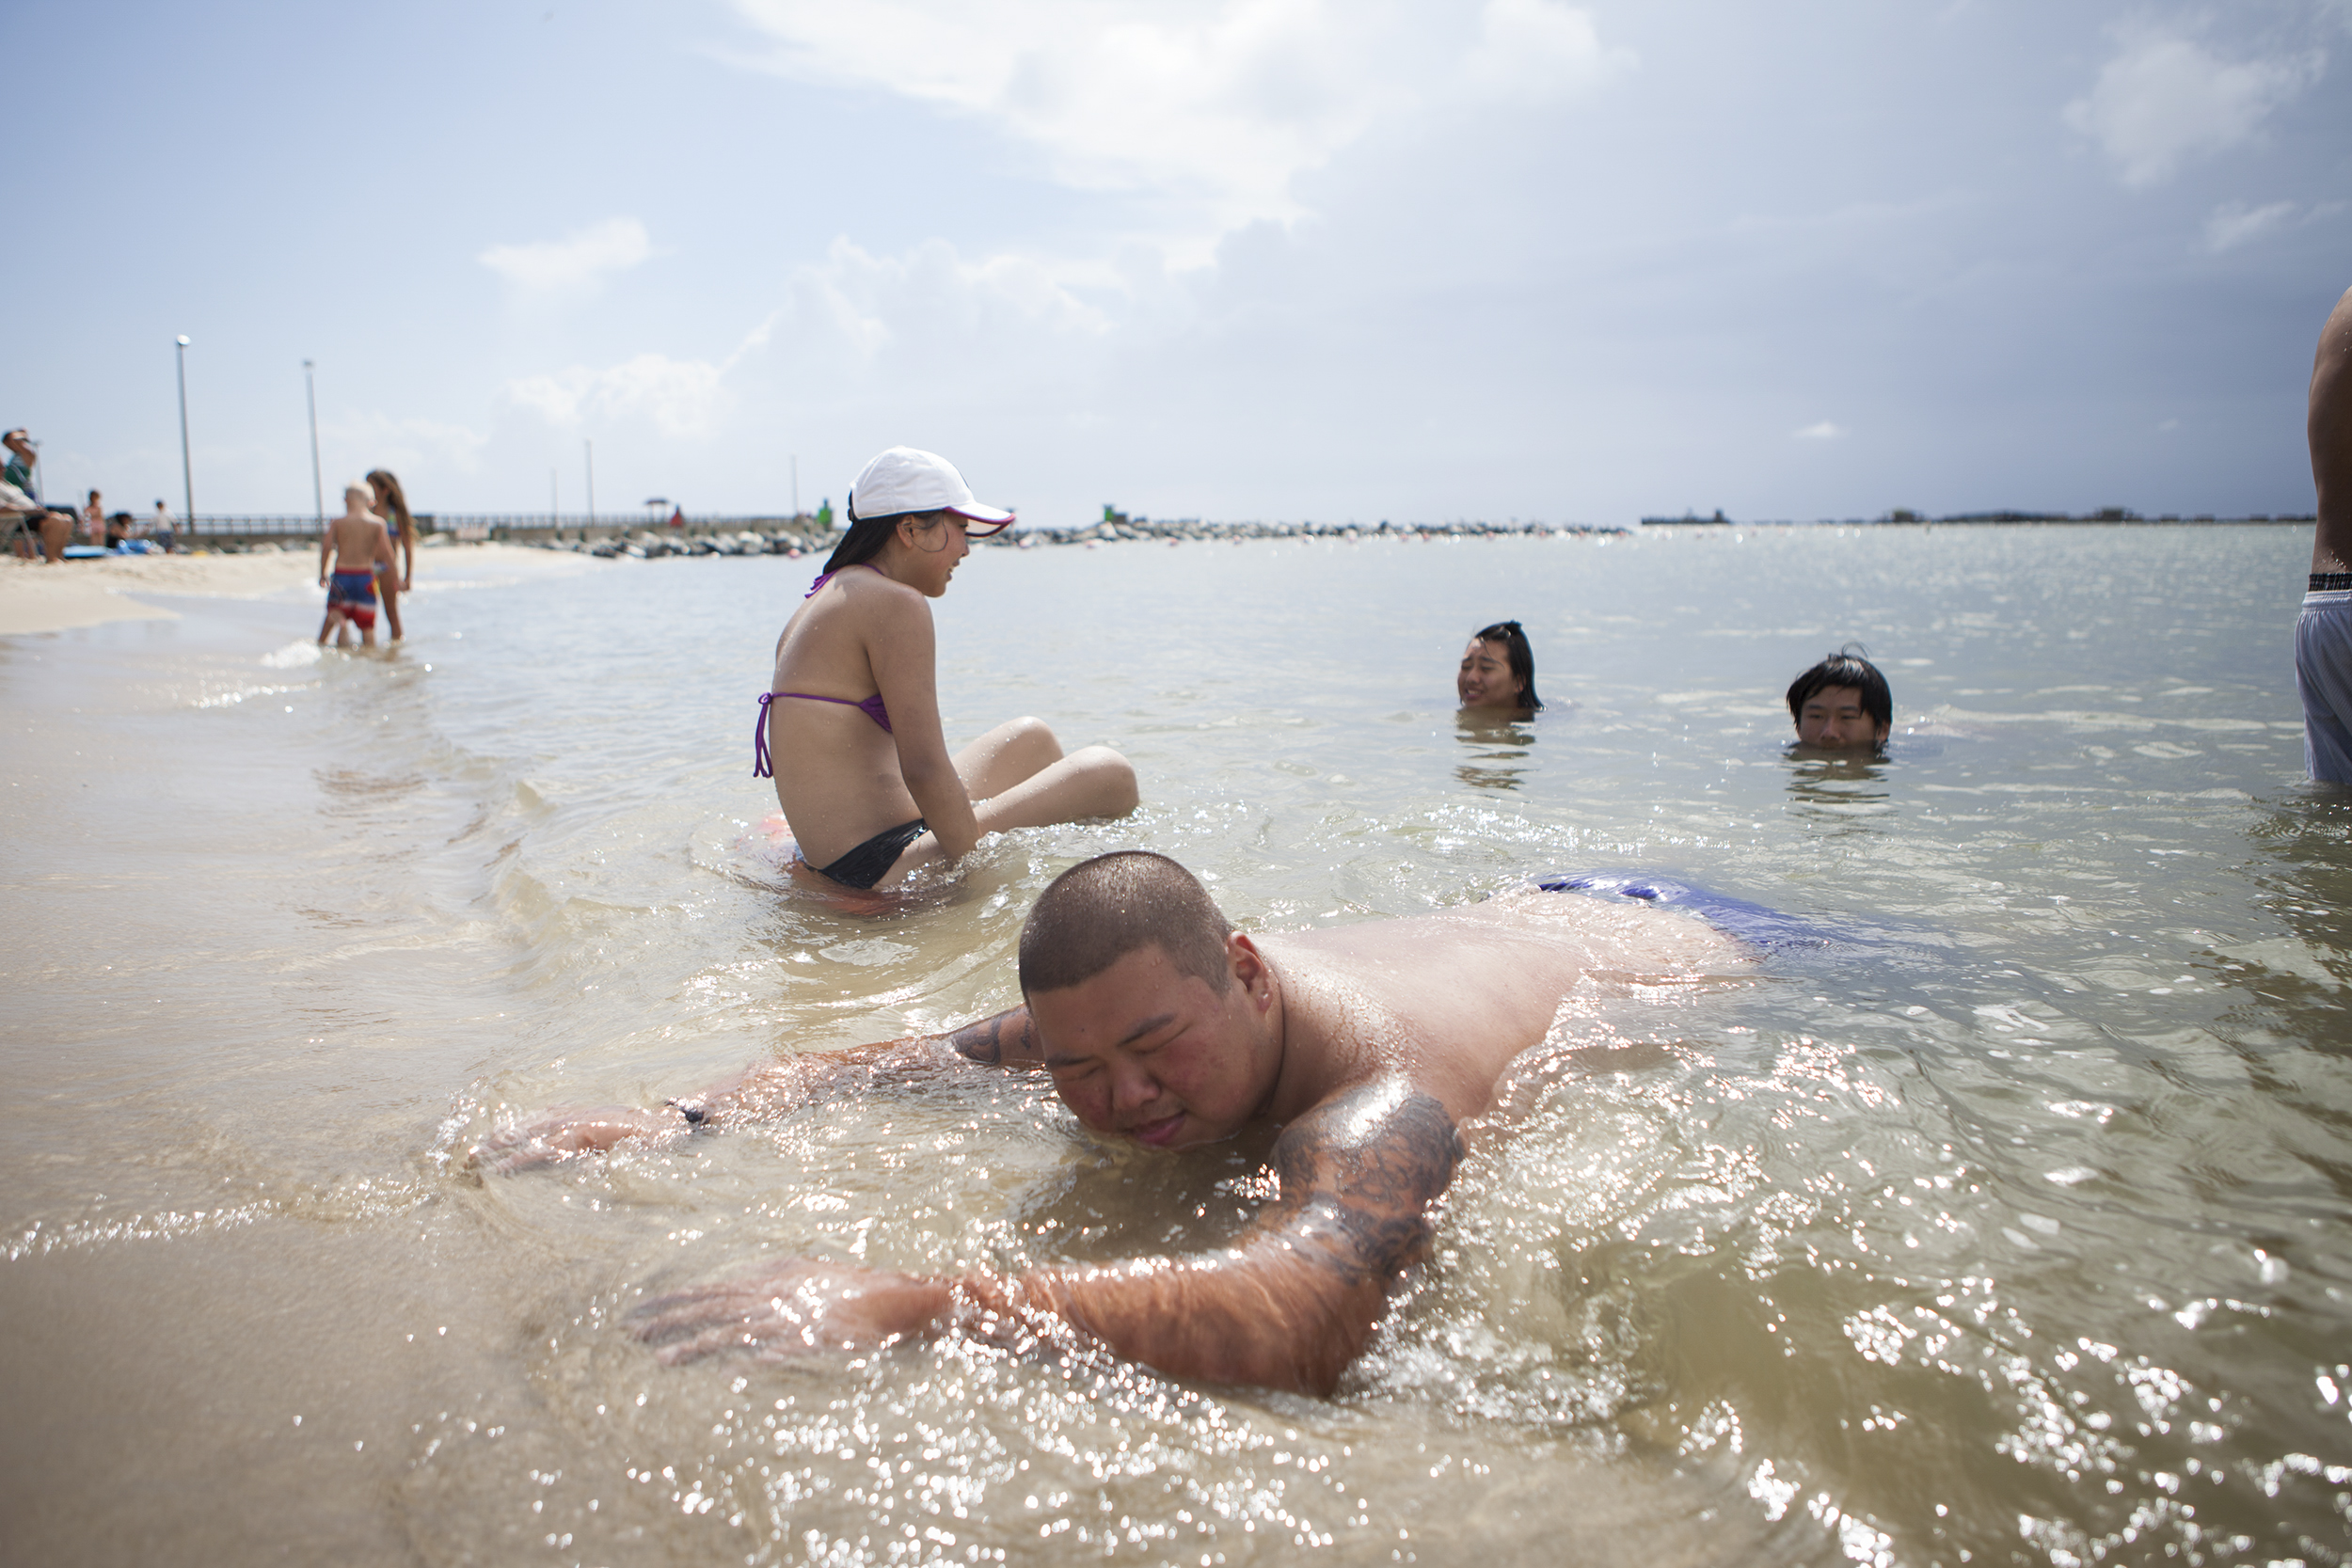 Stanley Ki, 20, basks on the sand.